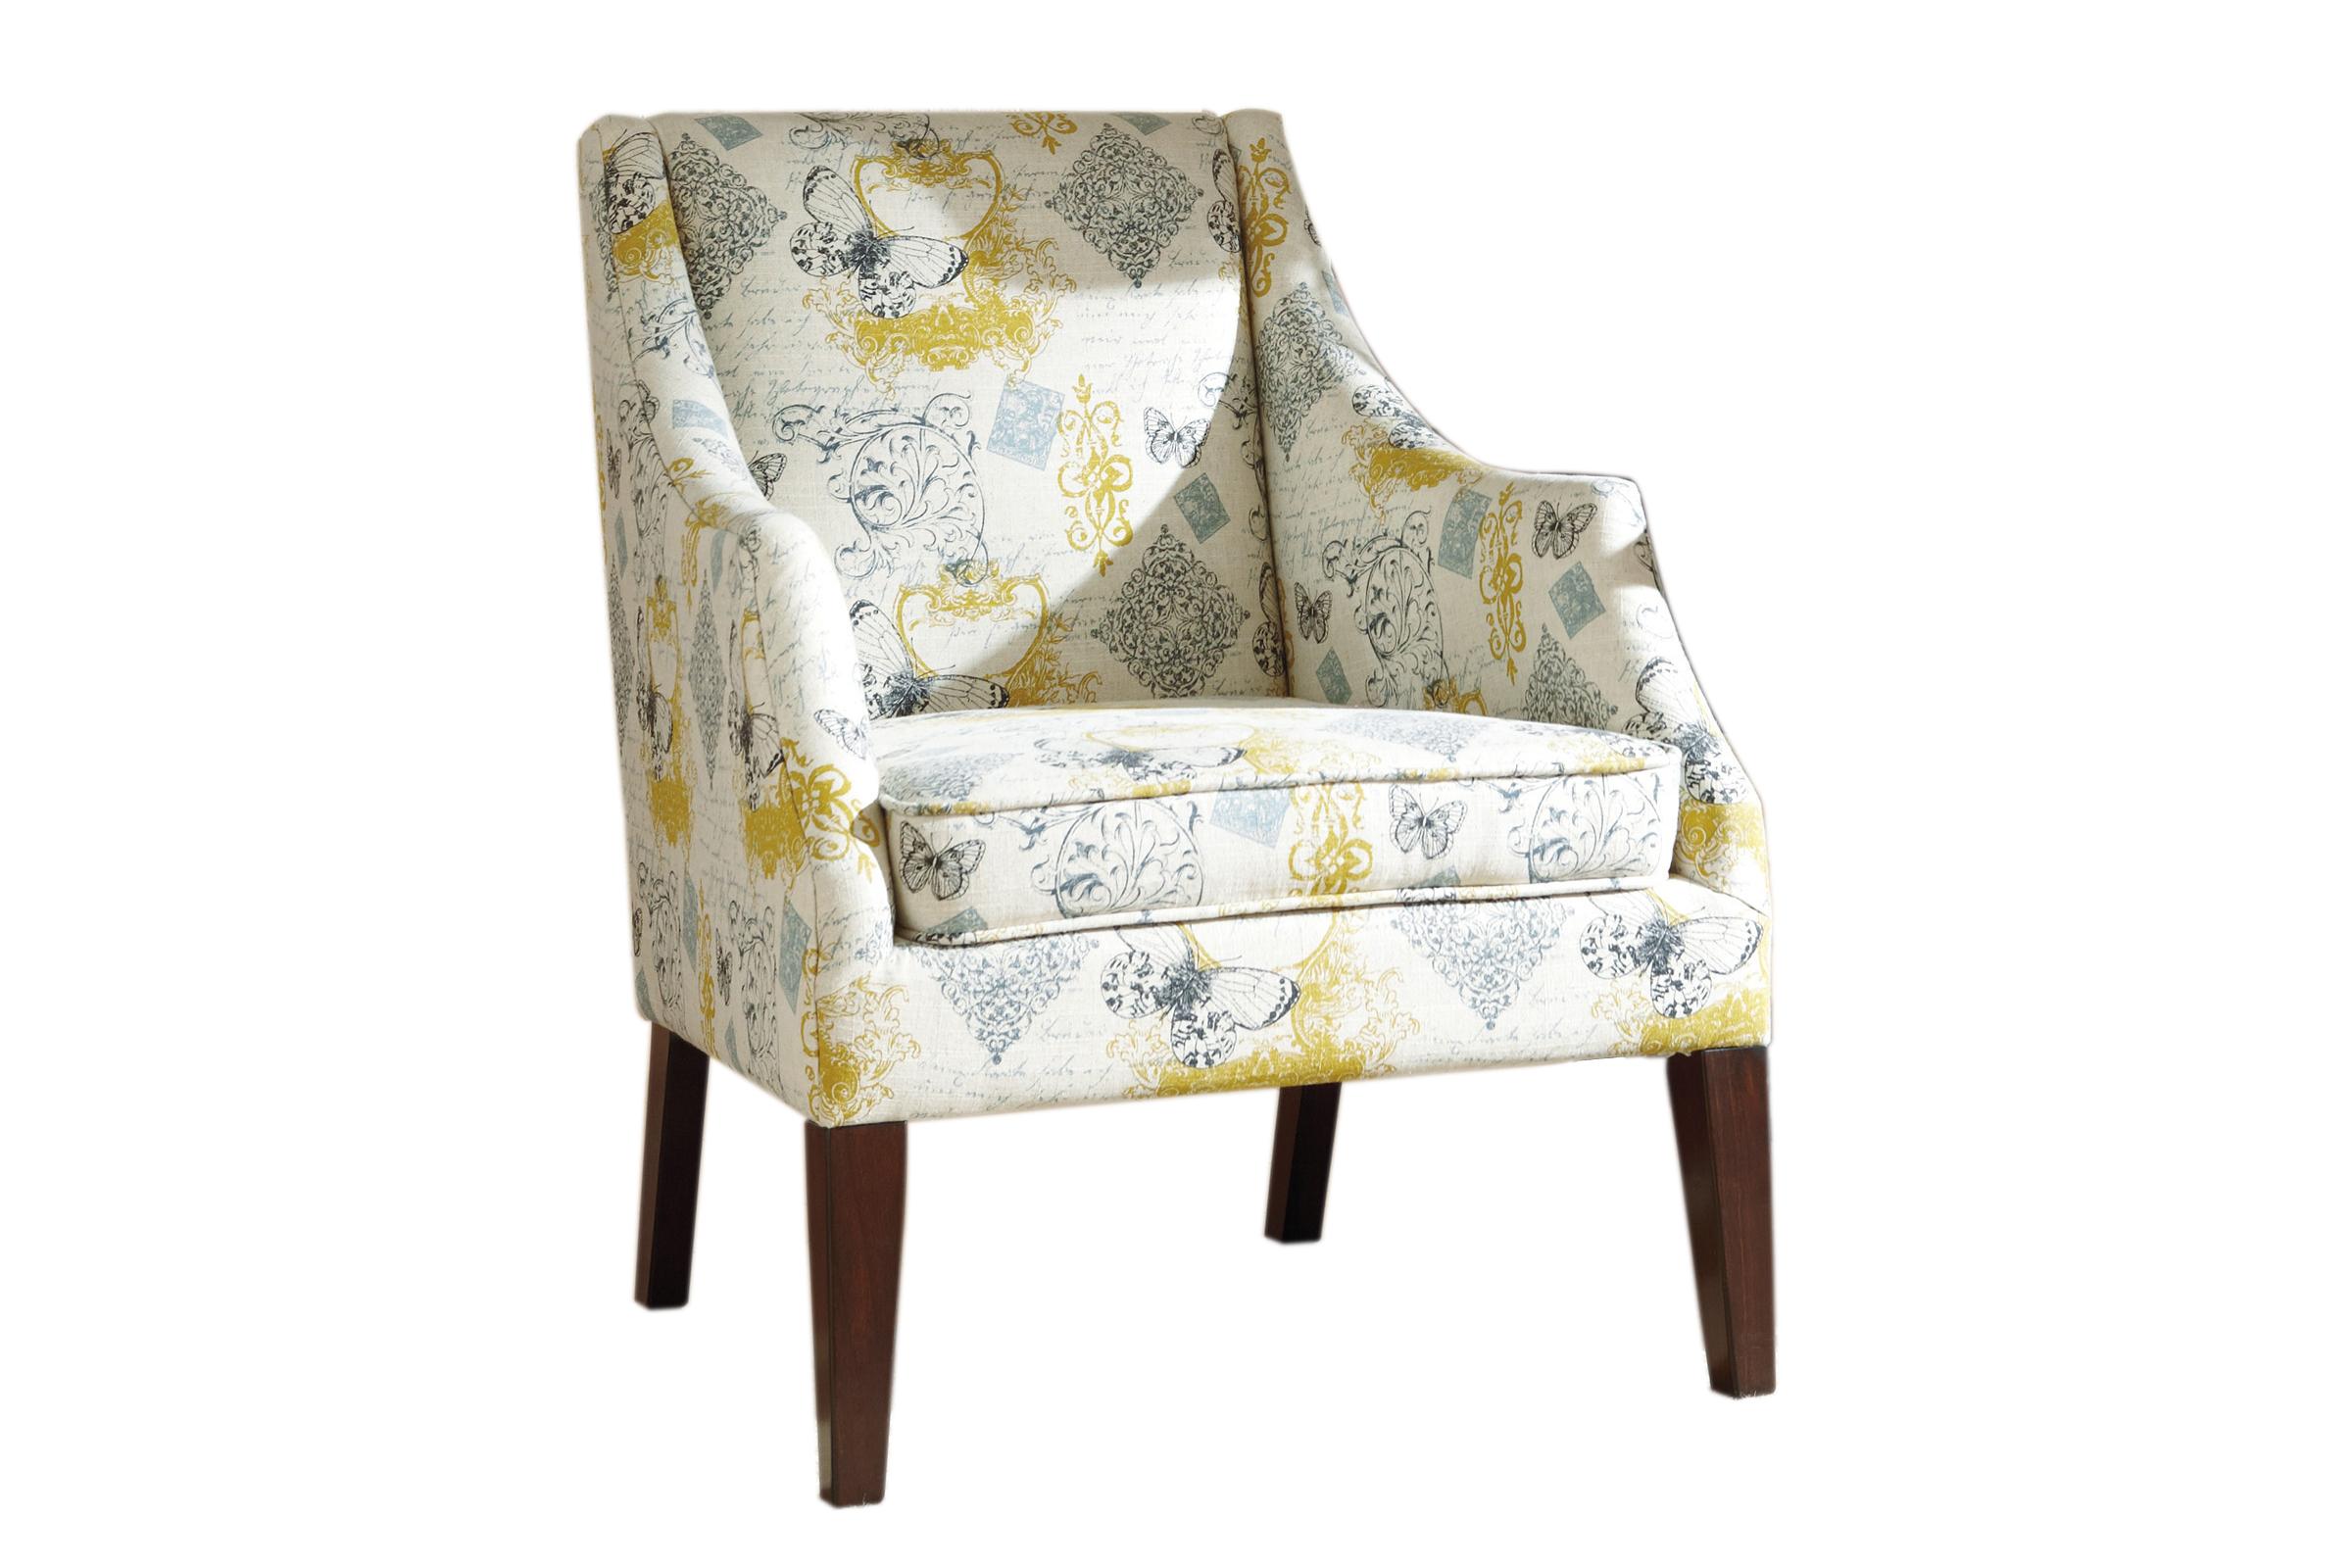 Hindell Park Putty Accent Chair 1680421*FDROP-170629 at Gardner-White